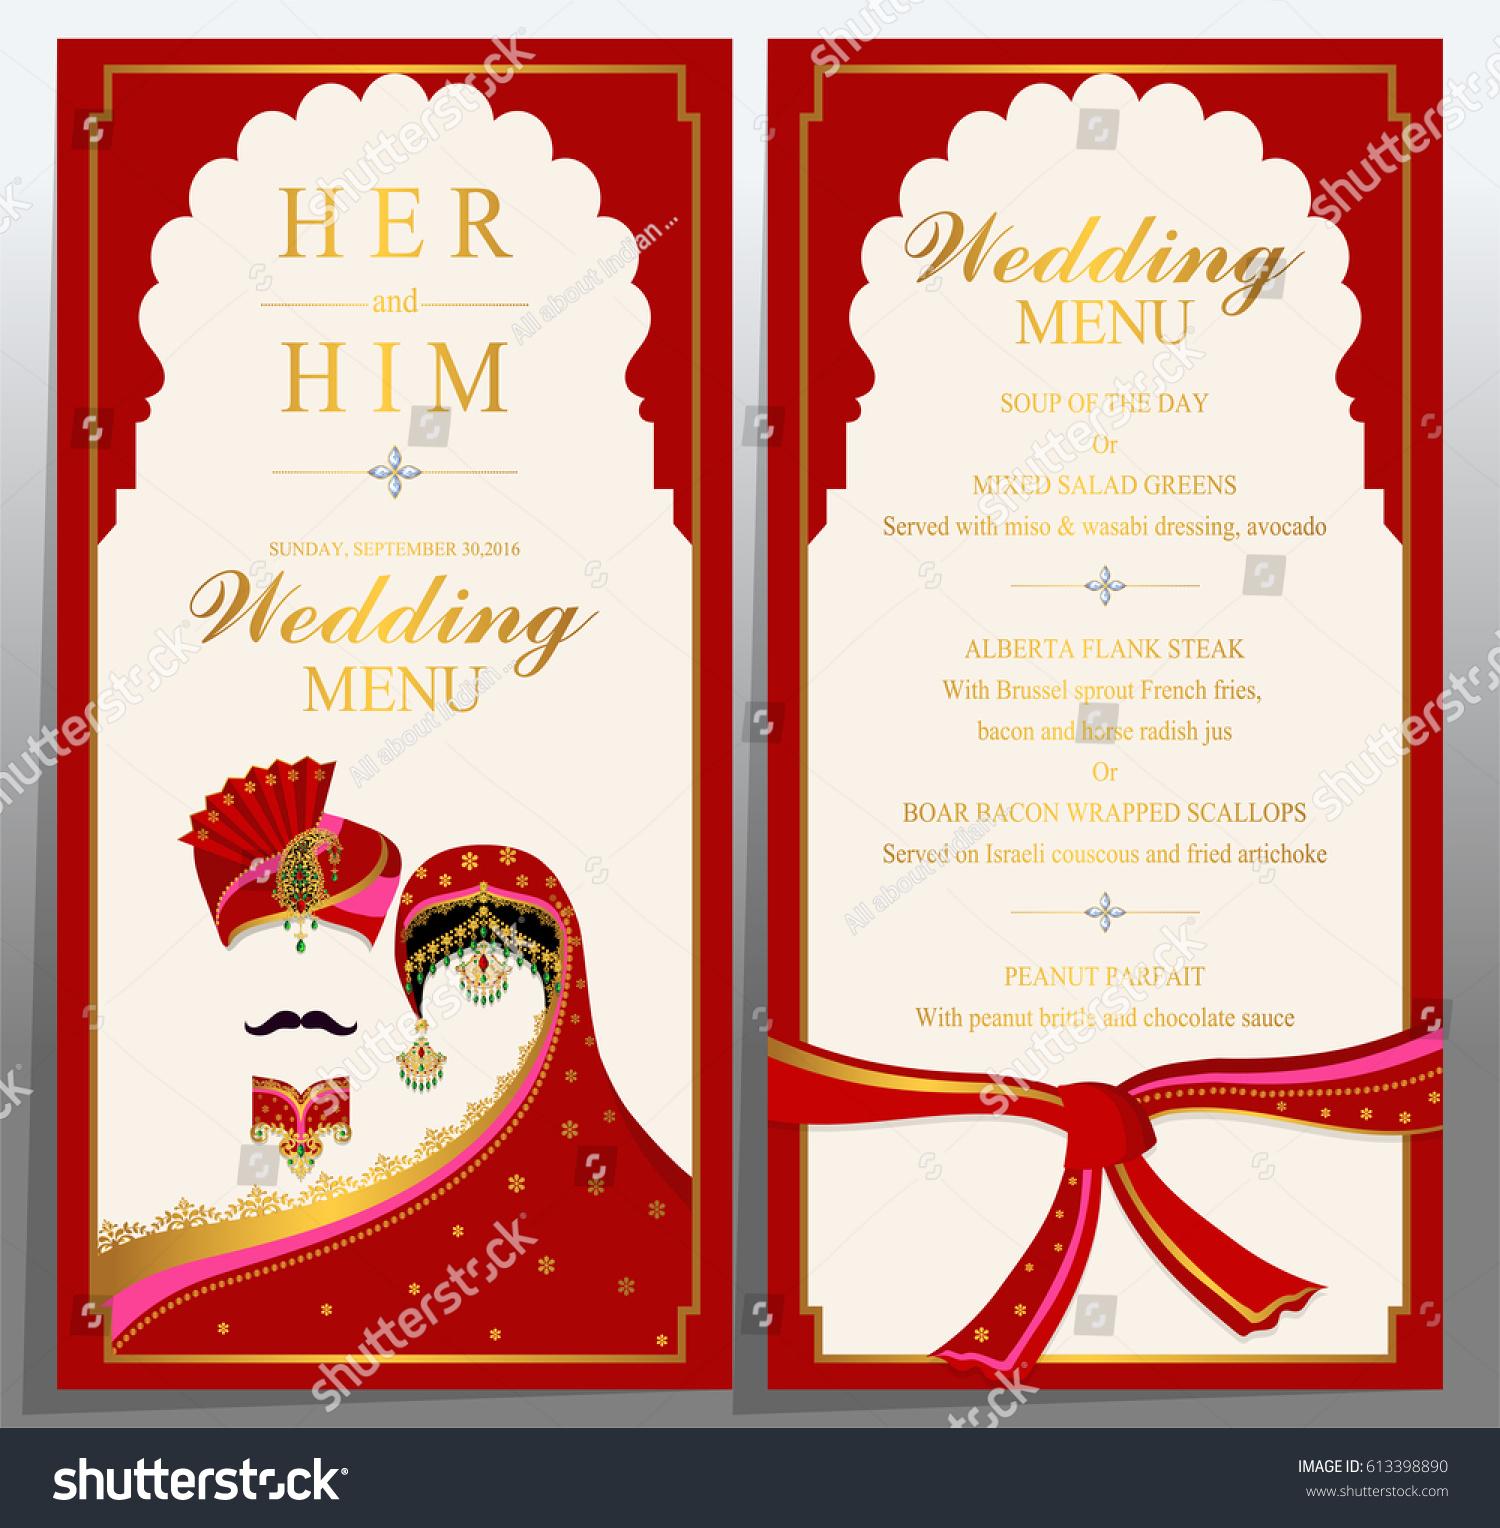 Wedding Menu Card Templates Gold Patterned Stock Vector 613398890 ...